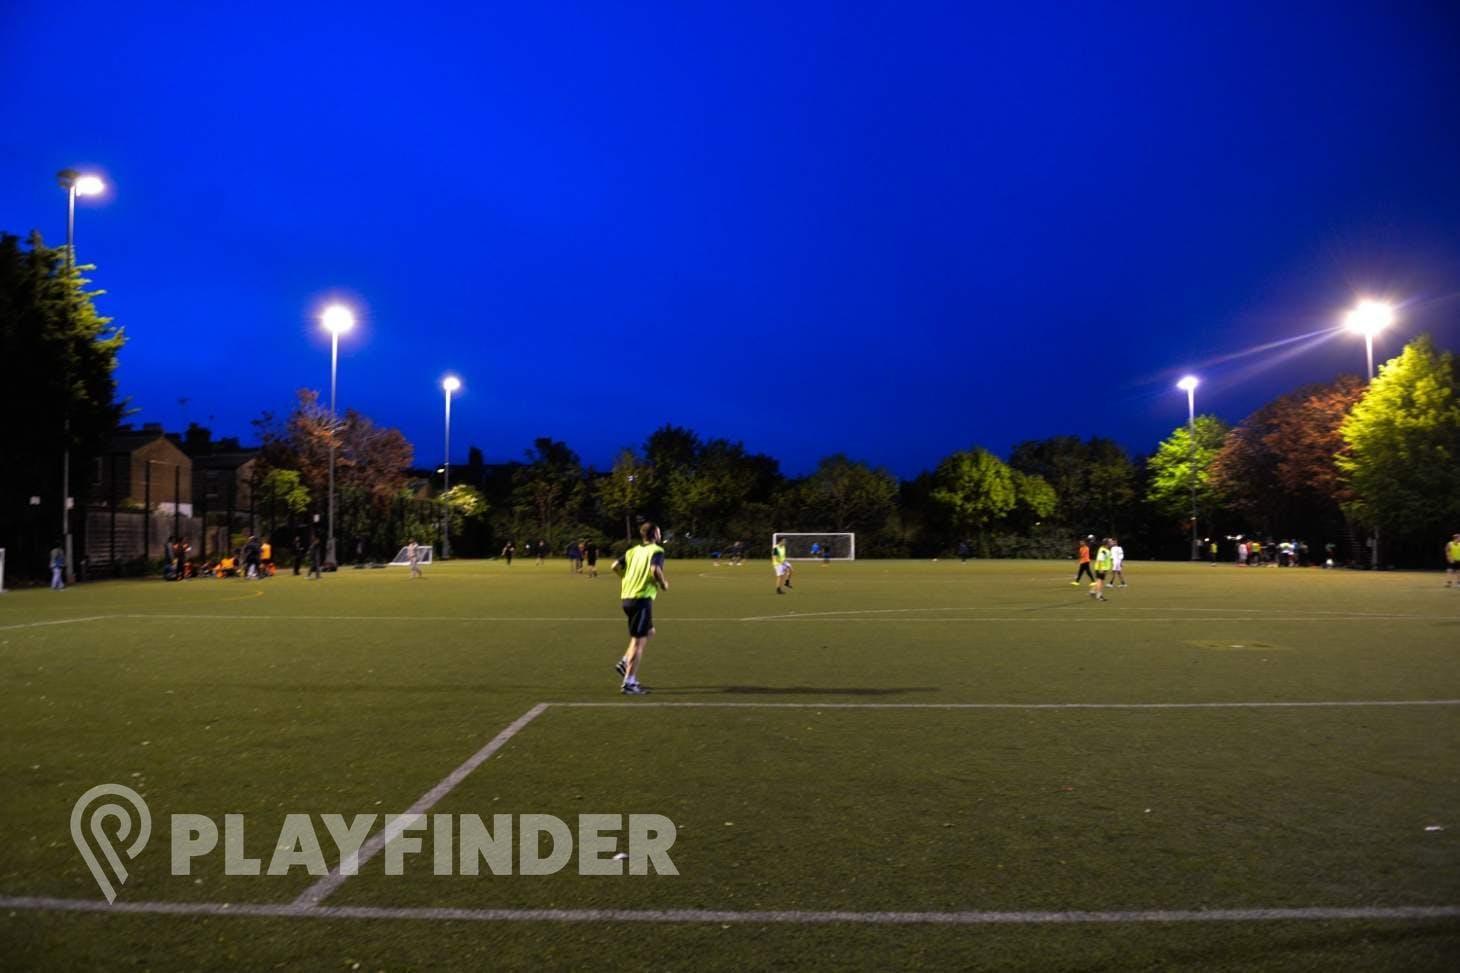 Whittington Park 7 a side | 3G Astroturf football pitch